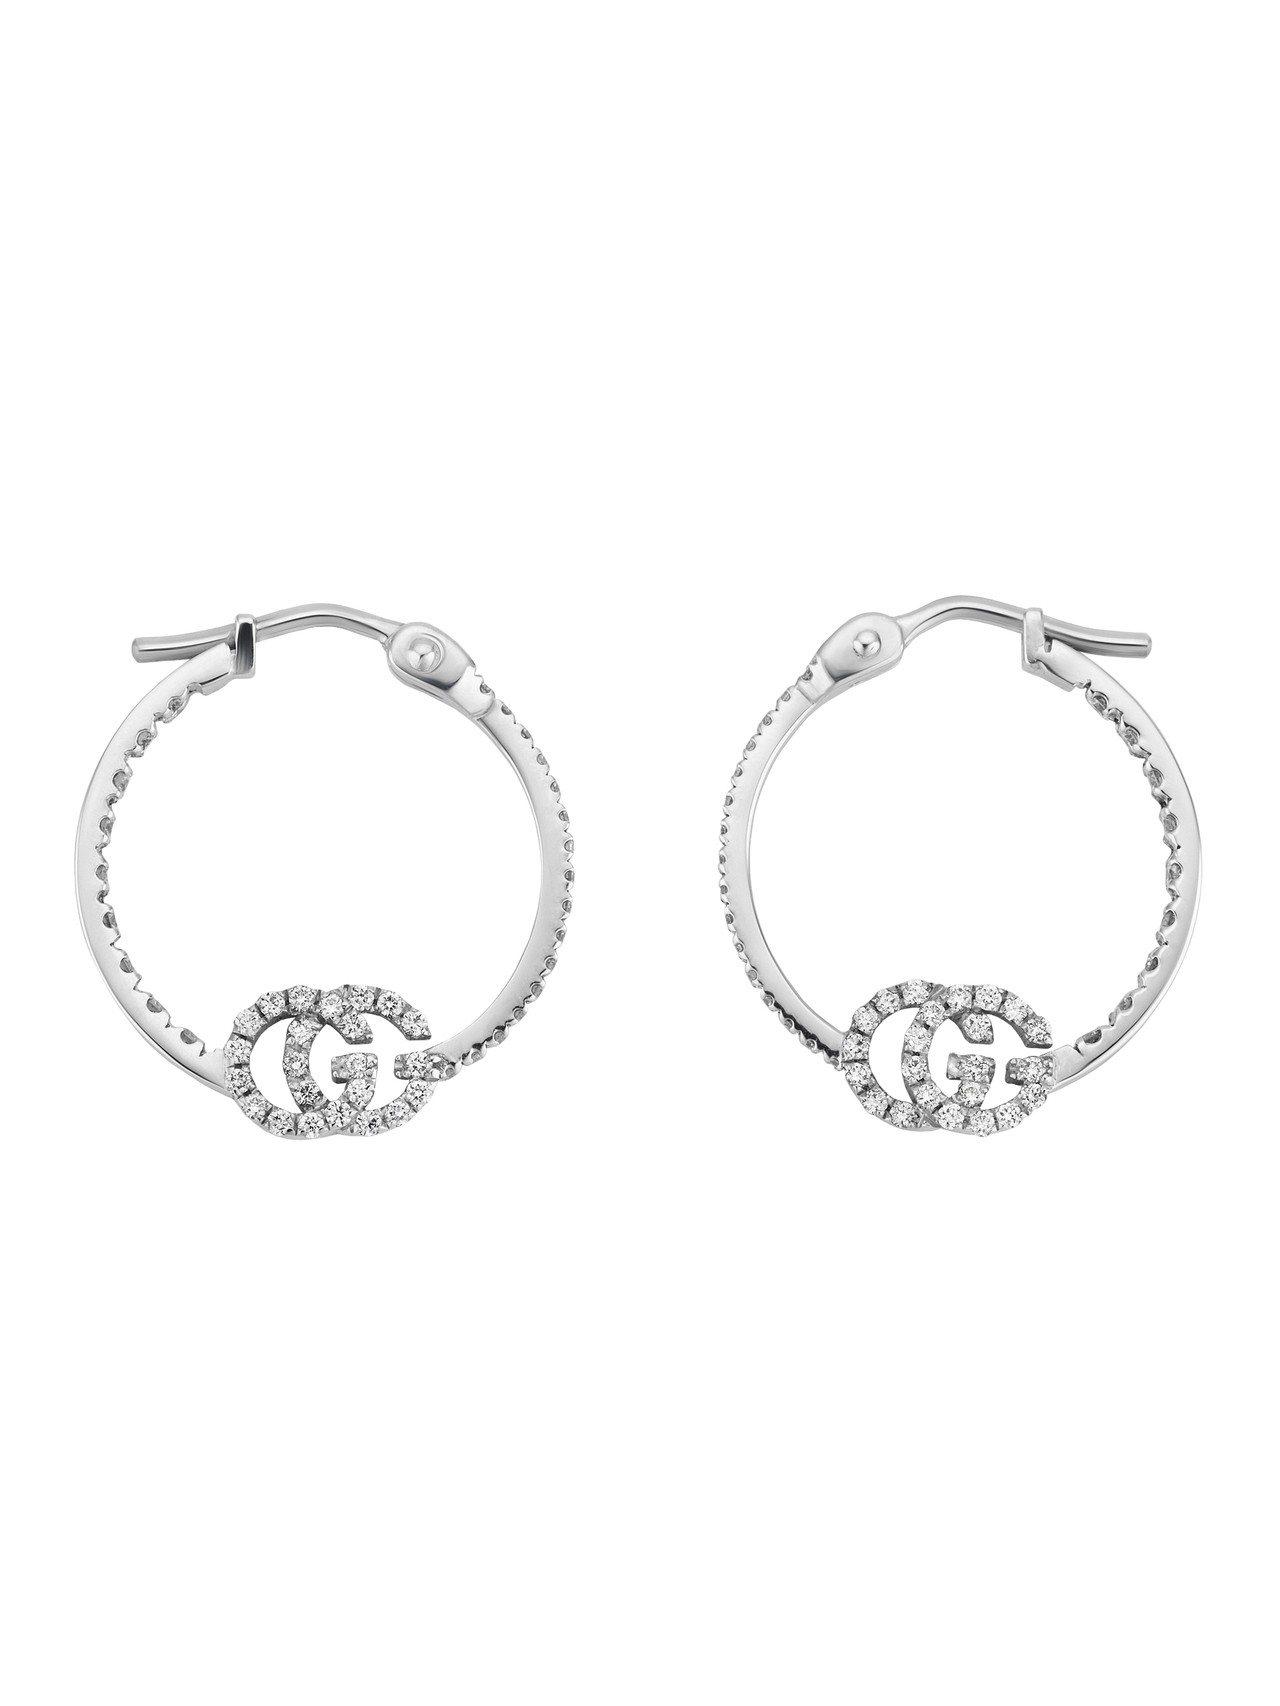 GG Running 18K白金G字鑽石耳環,97,200元。圖/古馳提供